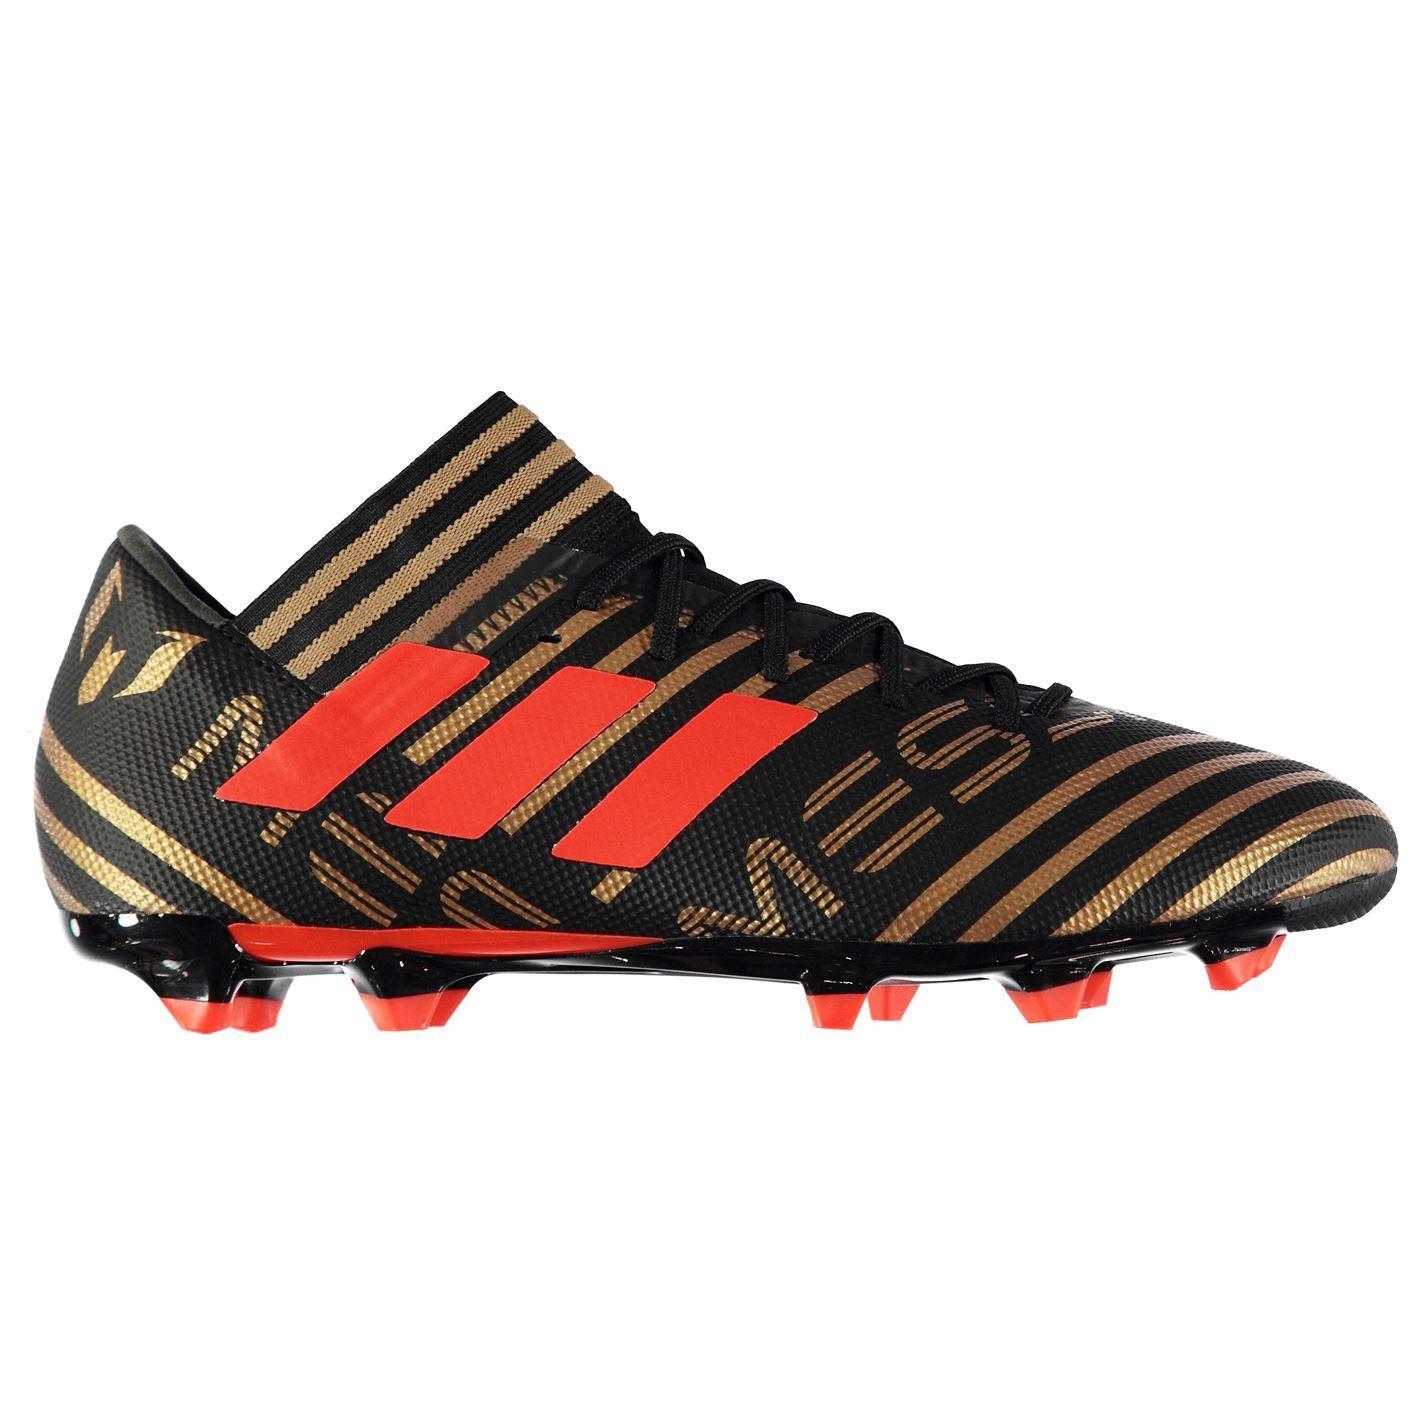 adidas Nemeziz Messi FG Noir Rouge 39 1 3 eBay